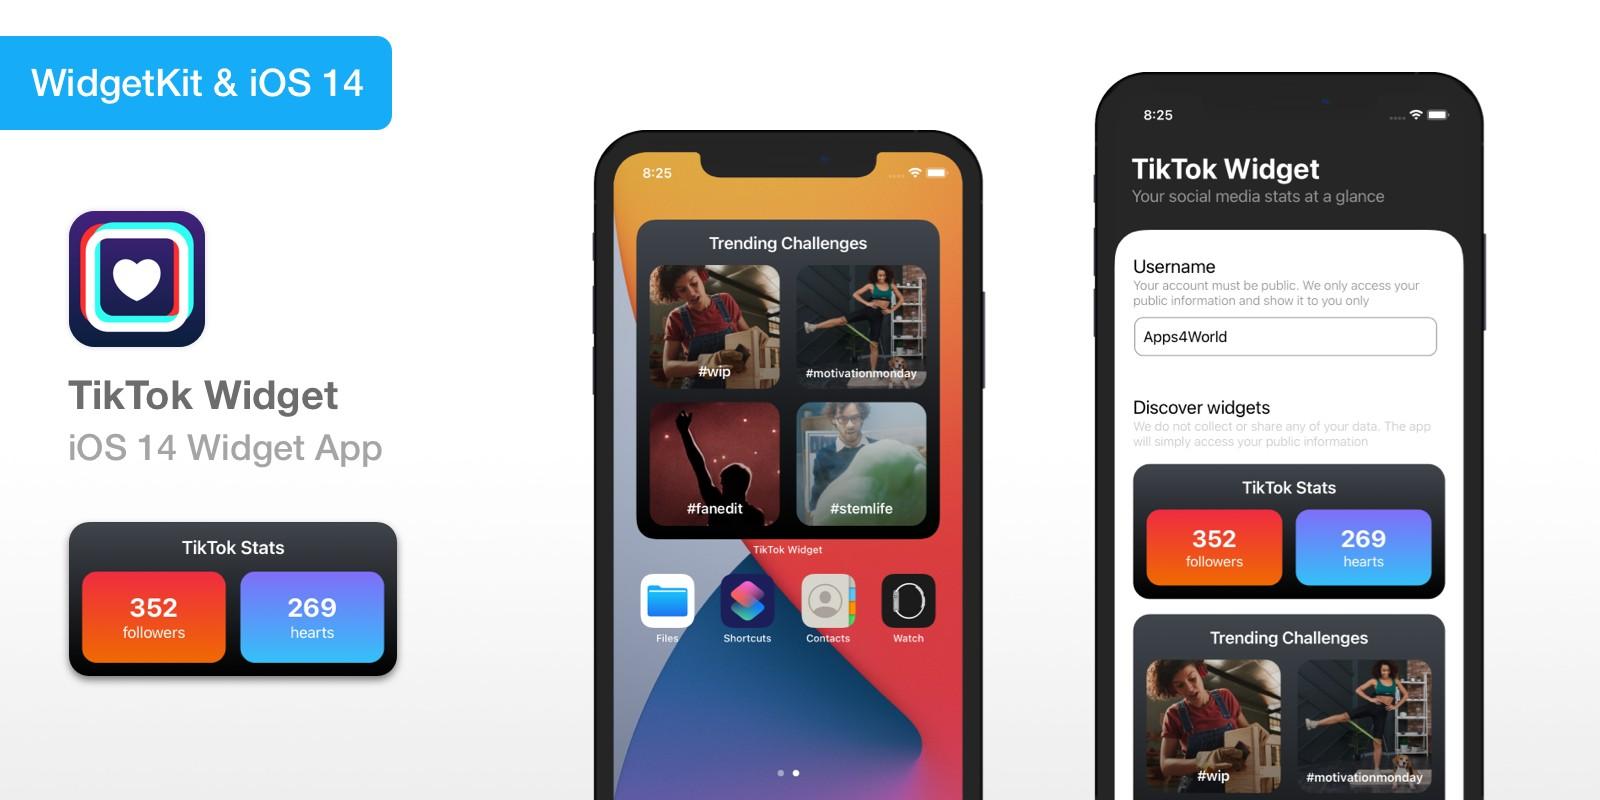 TikTok Widget - iOS 14 Widget App Source Code